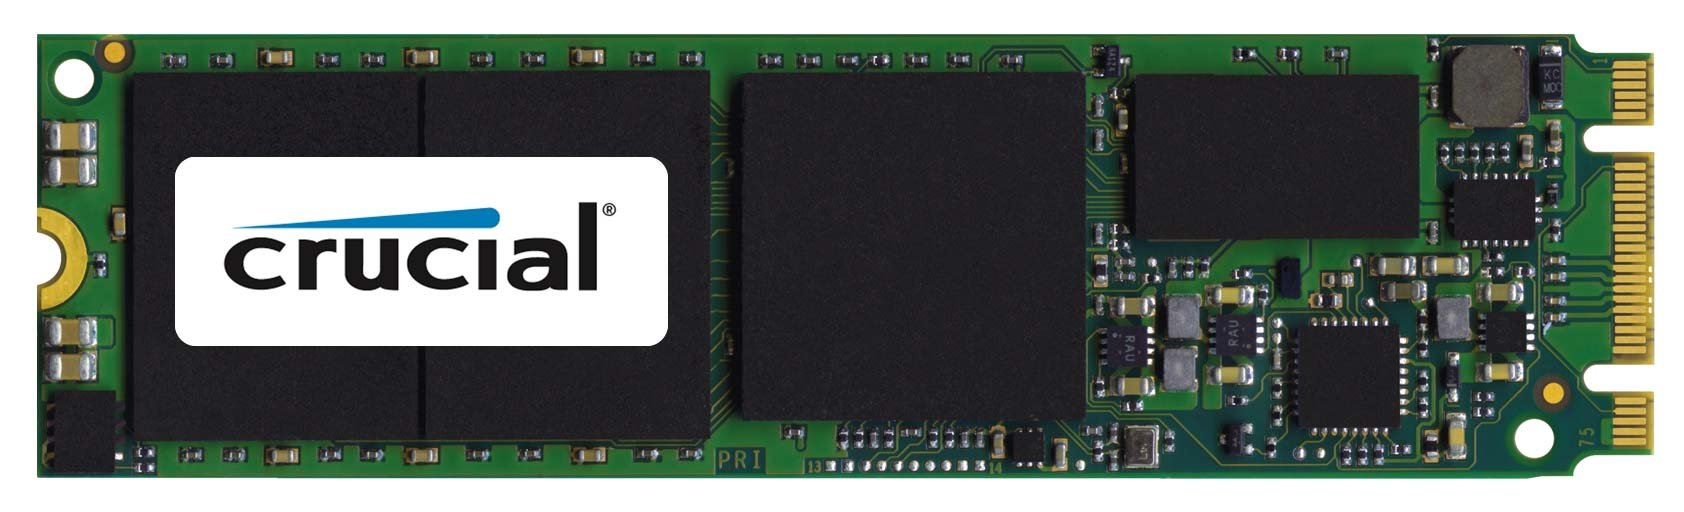 480gb Ssd M.2 2280 Crucial M500 Ct480m500ssd4